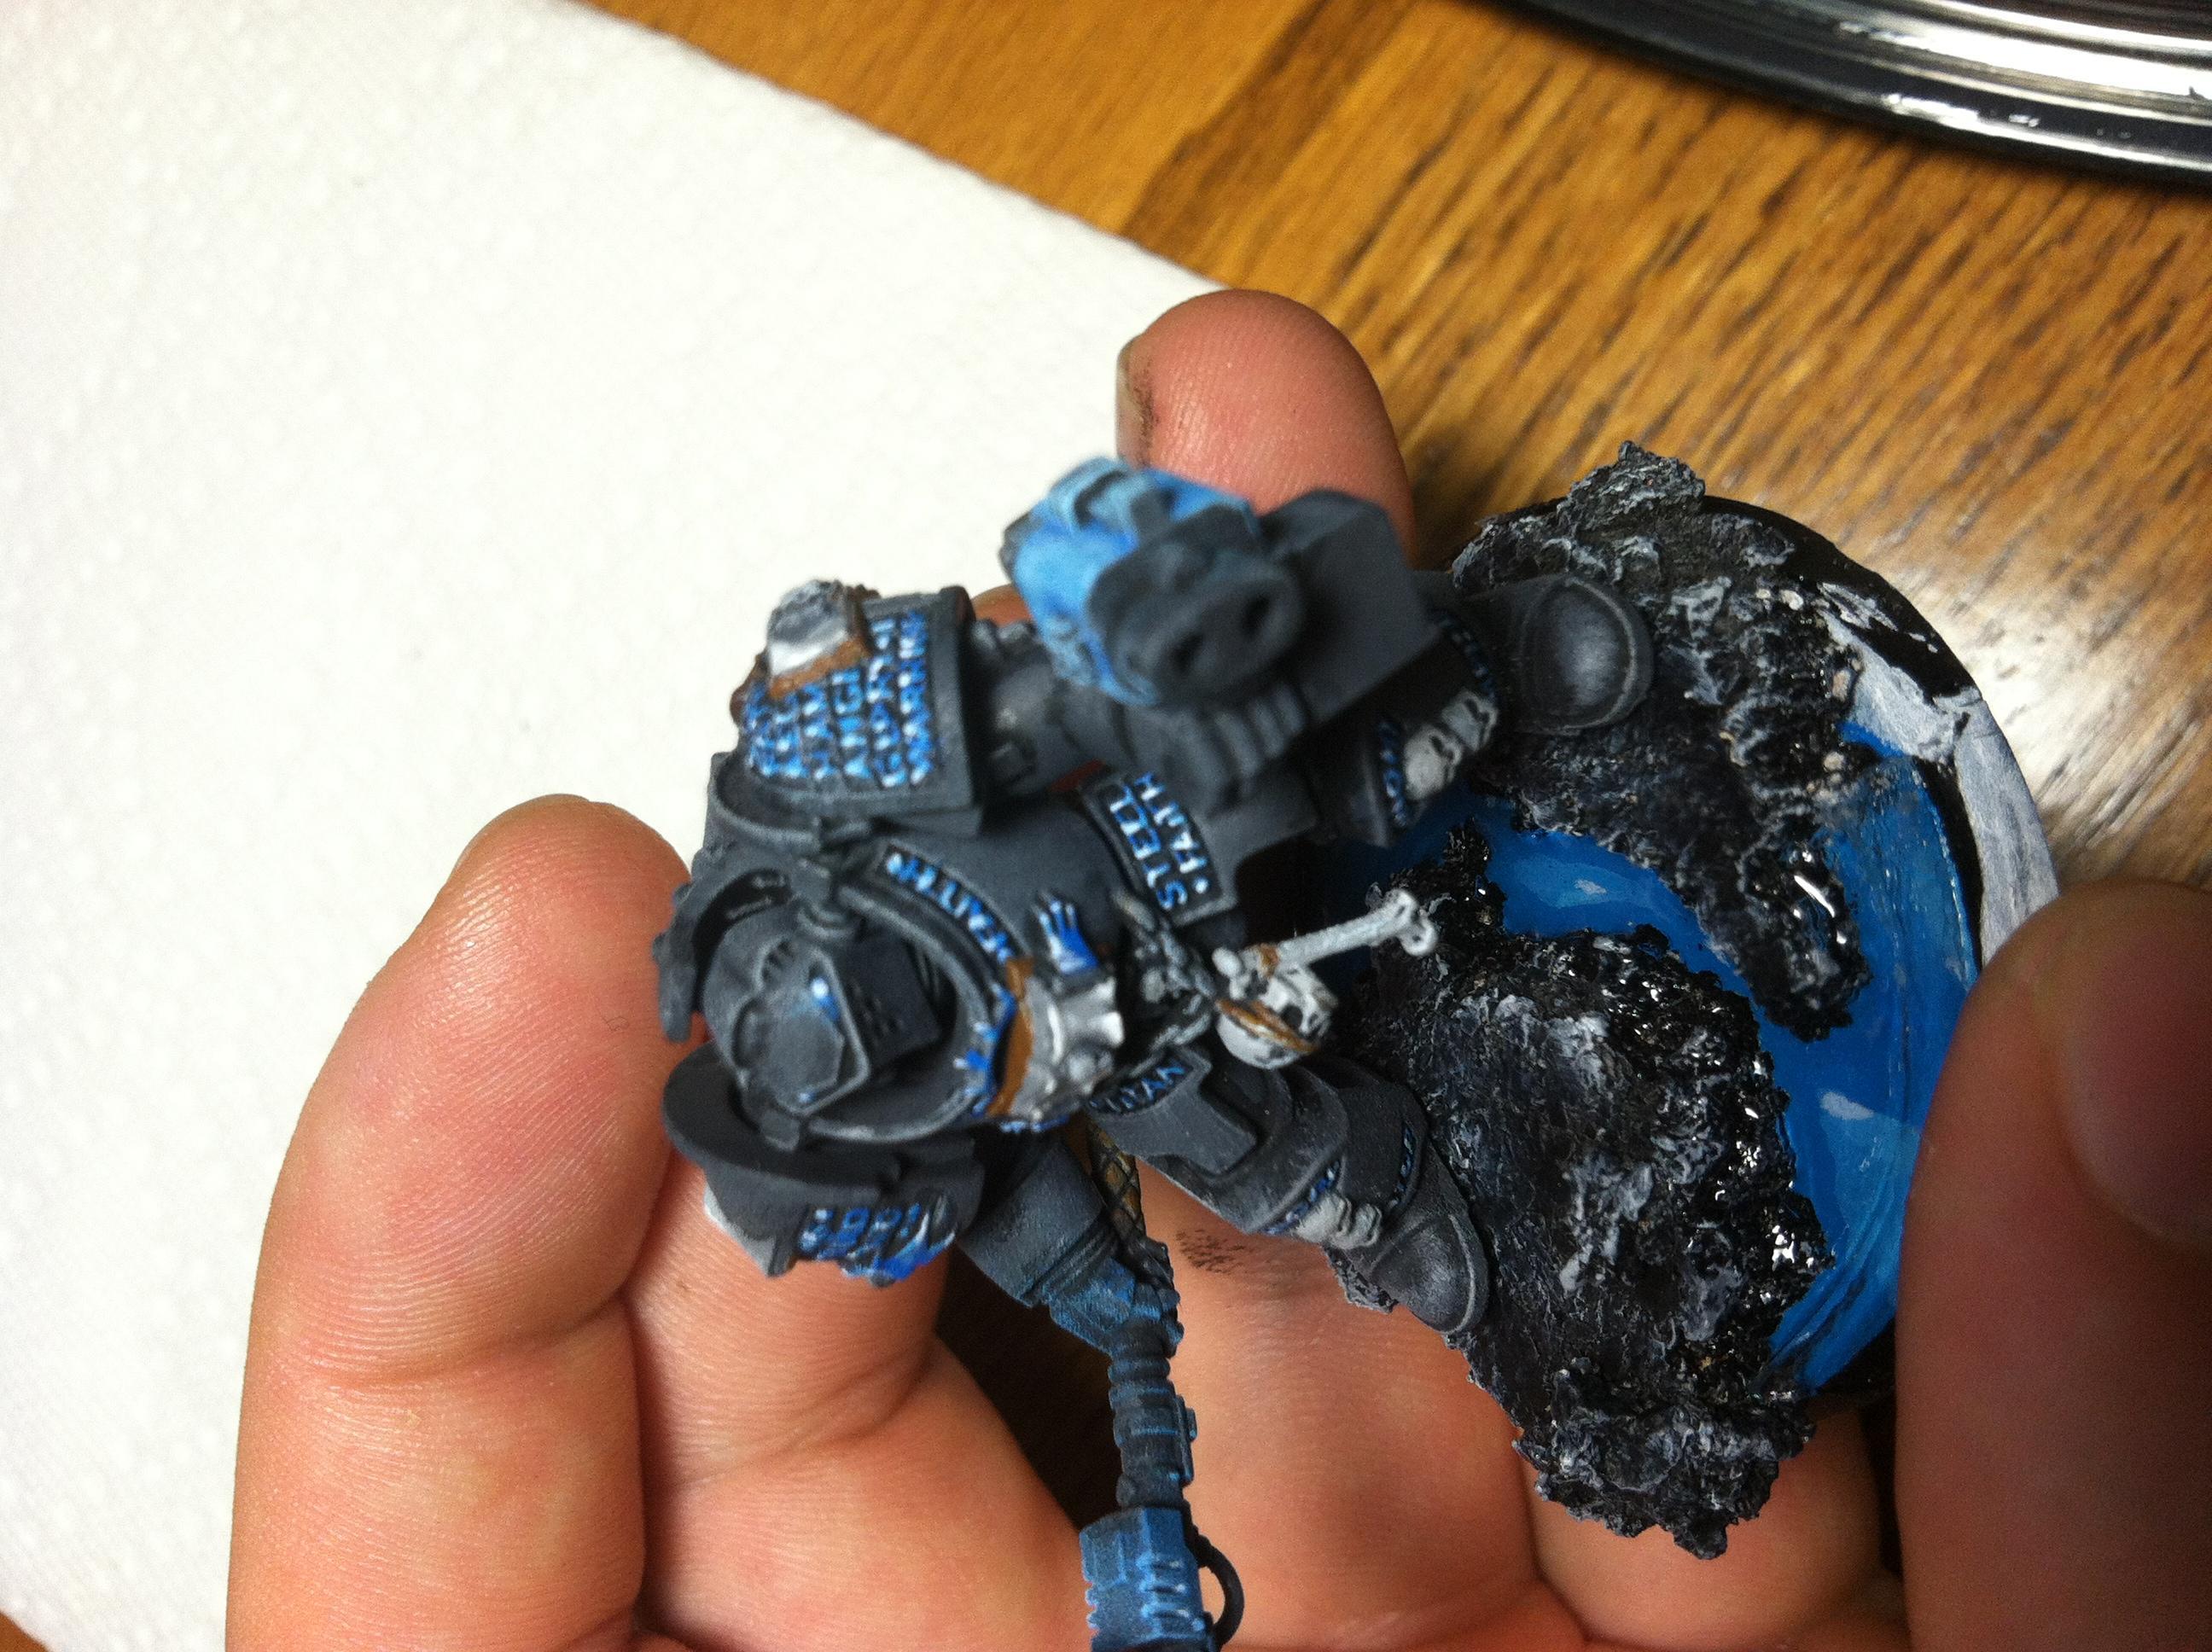 Gk, Grey Knights, Terminator Armor, Work In Progress